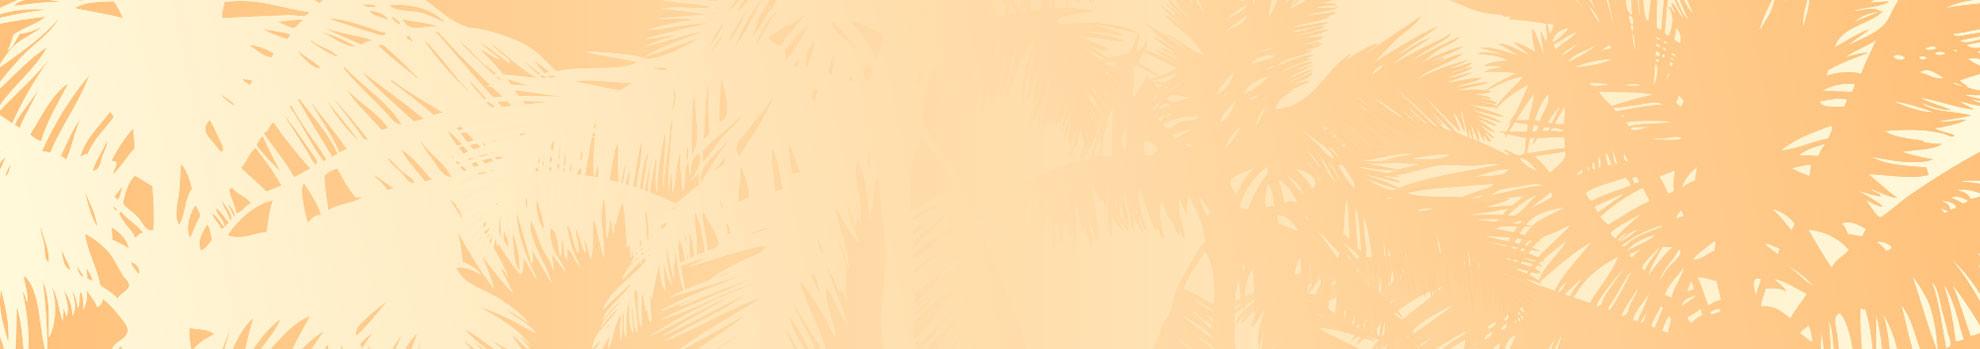 BRZY Background image